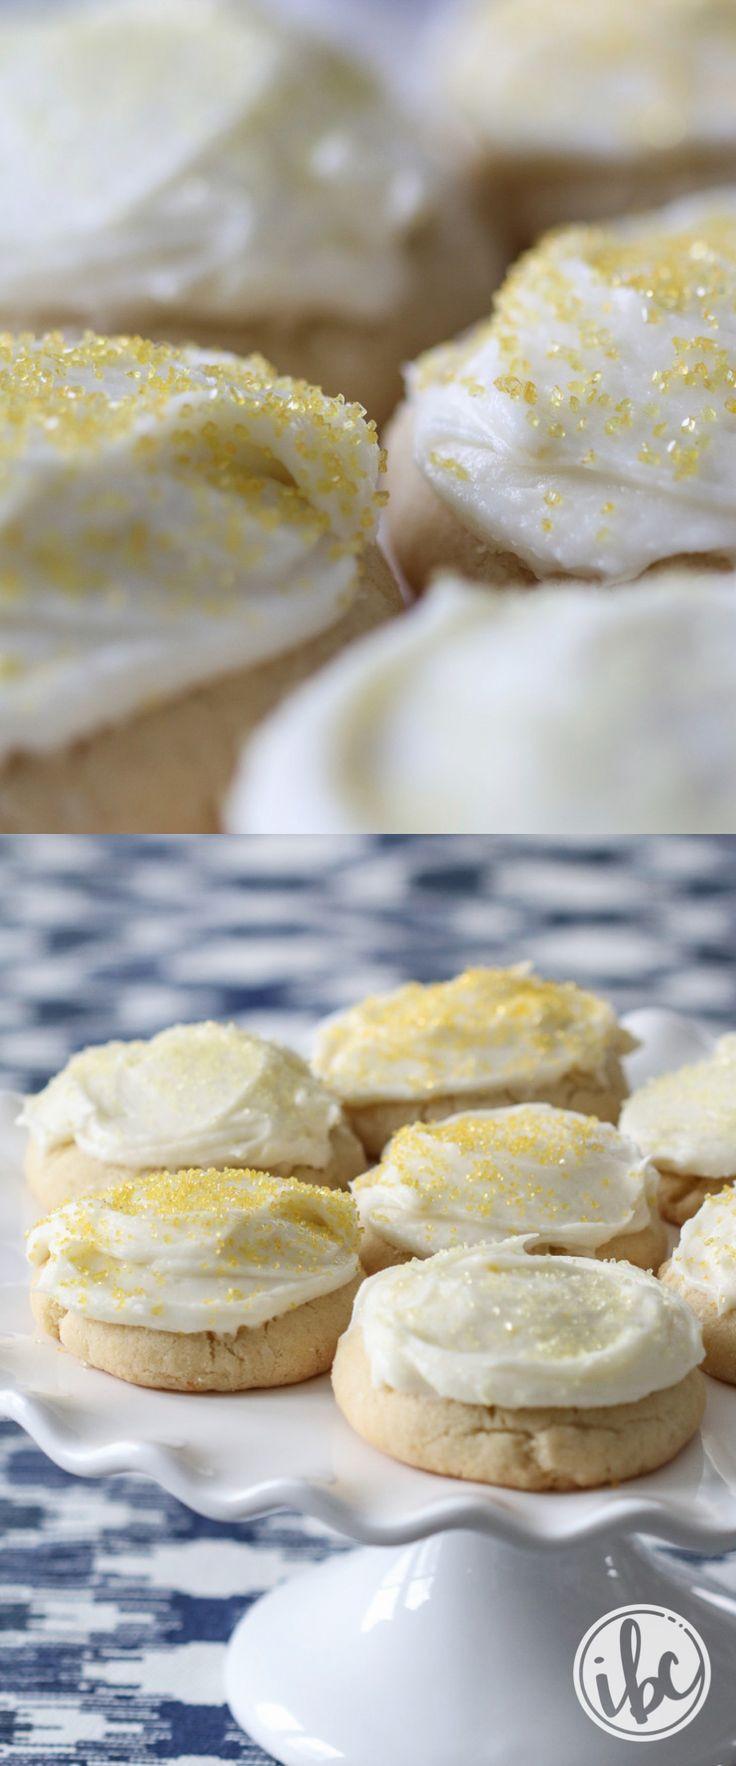 Lemon Easter Desserts  246 best i CELEBRATE easter images on Pinterest